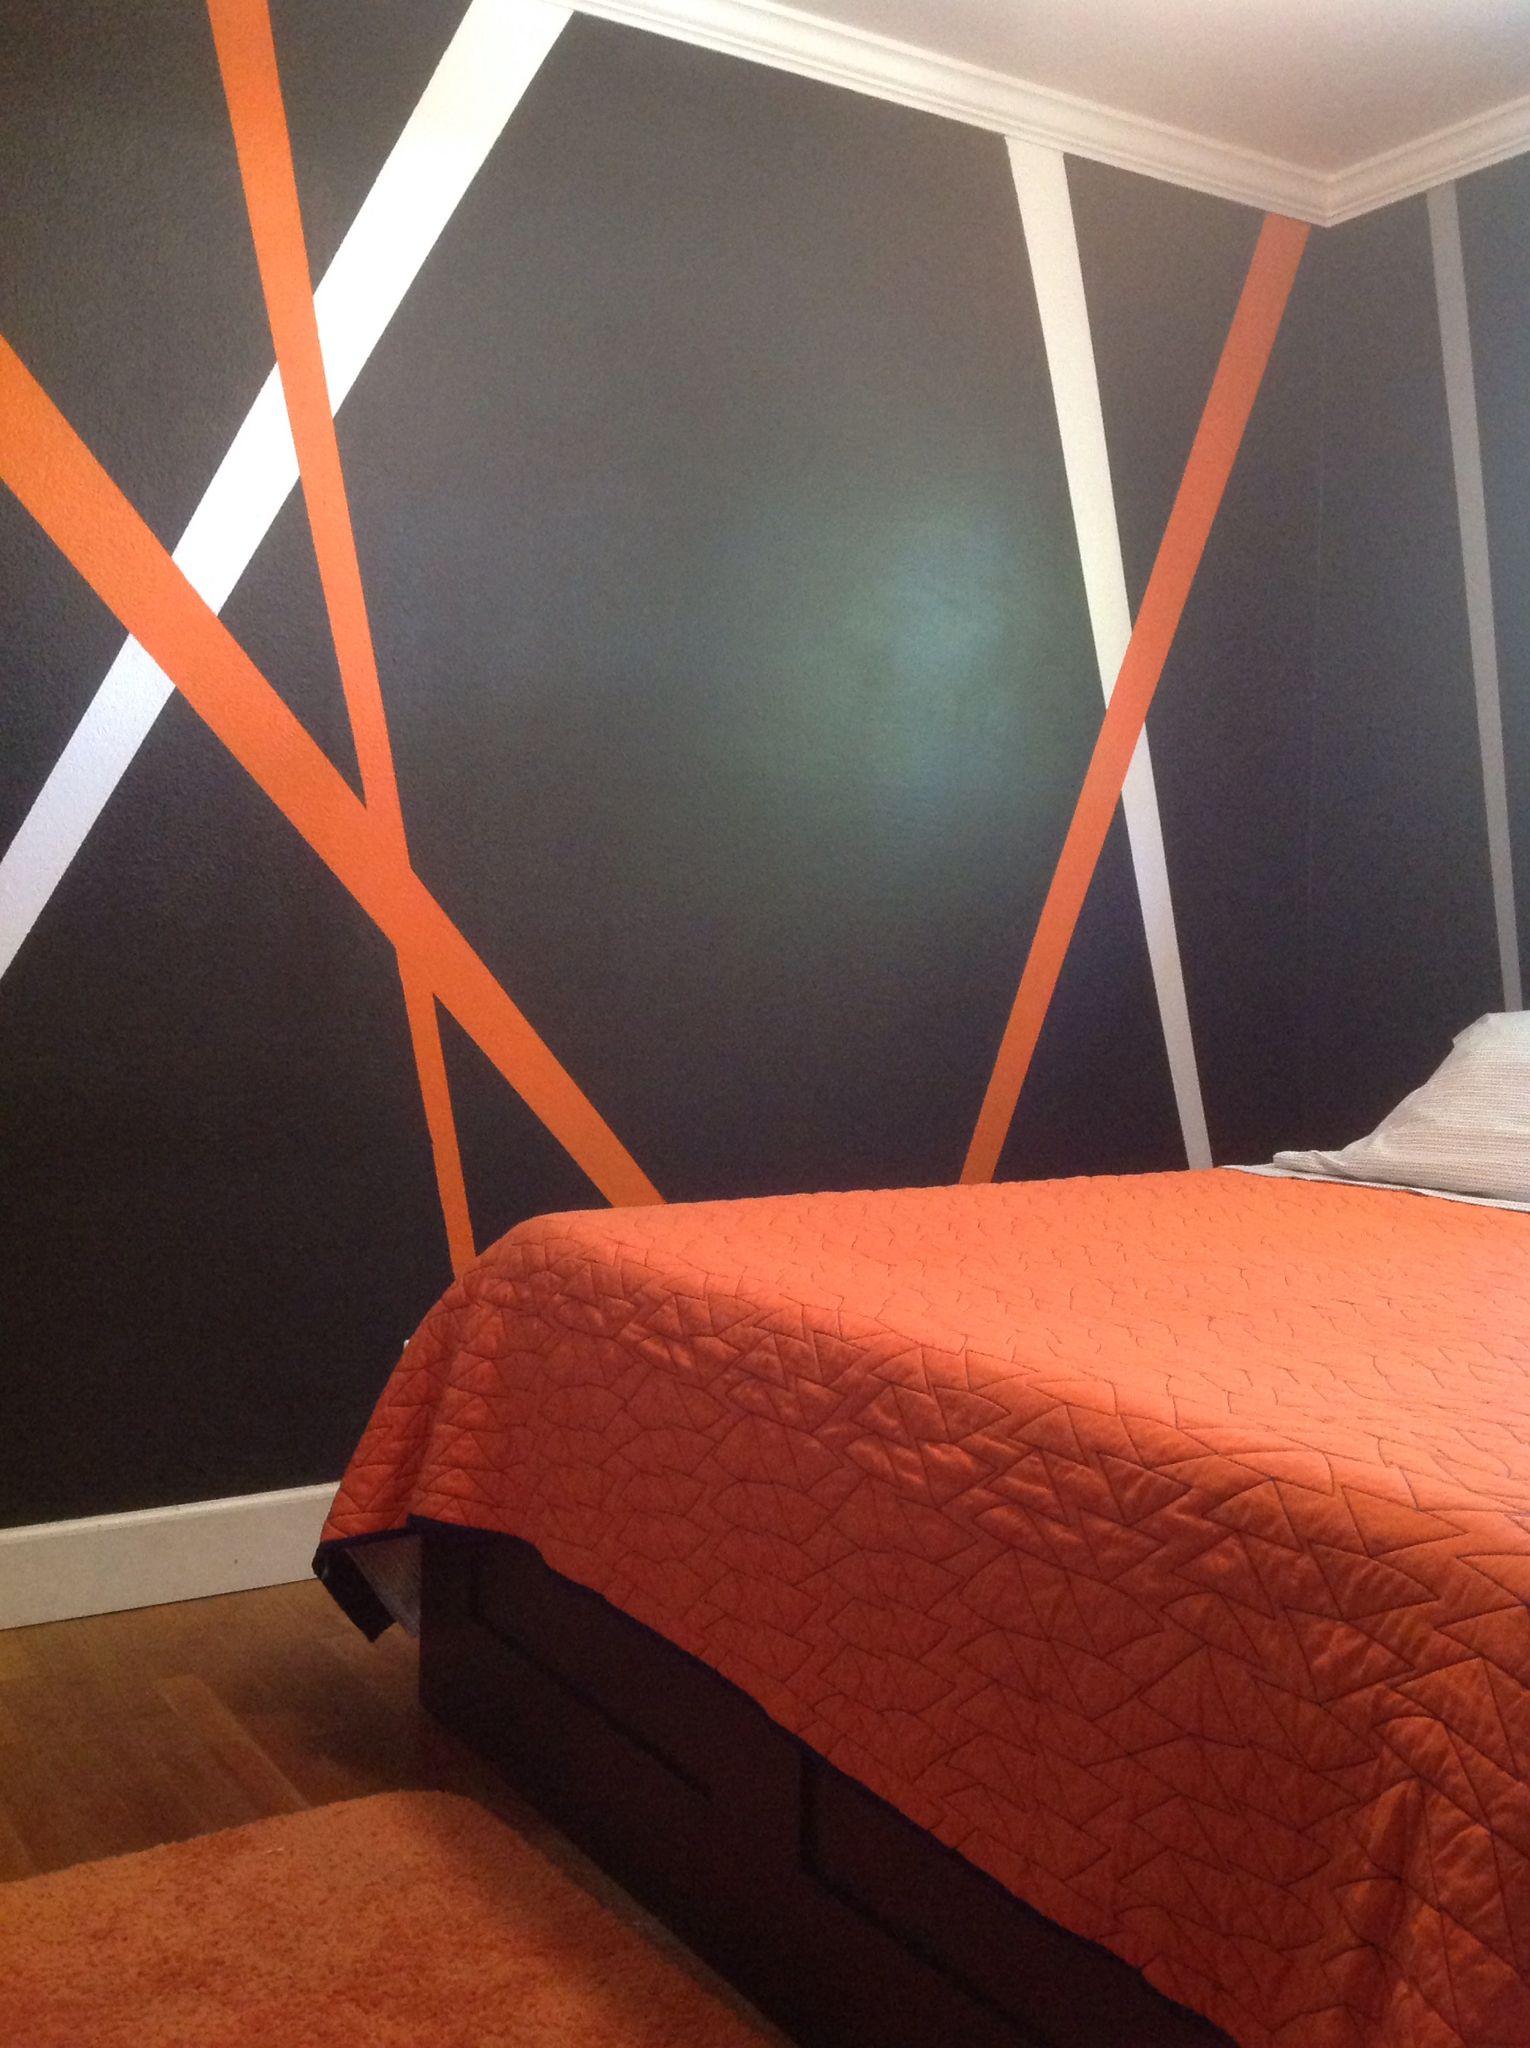 Grey Orange White My New Teenage Boy Bedroom Decor With